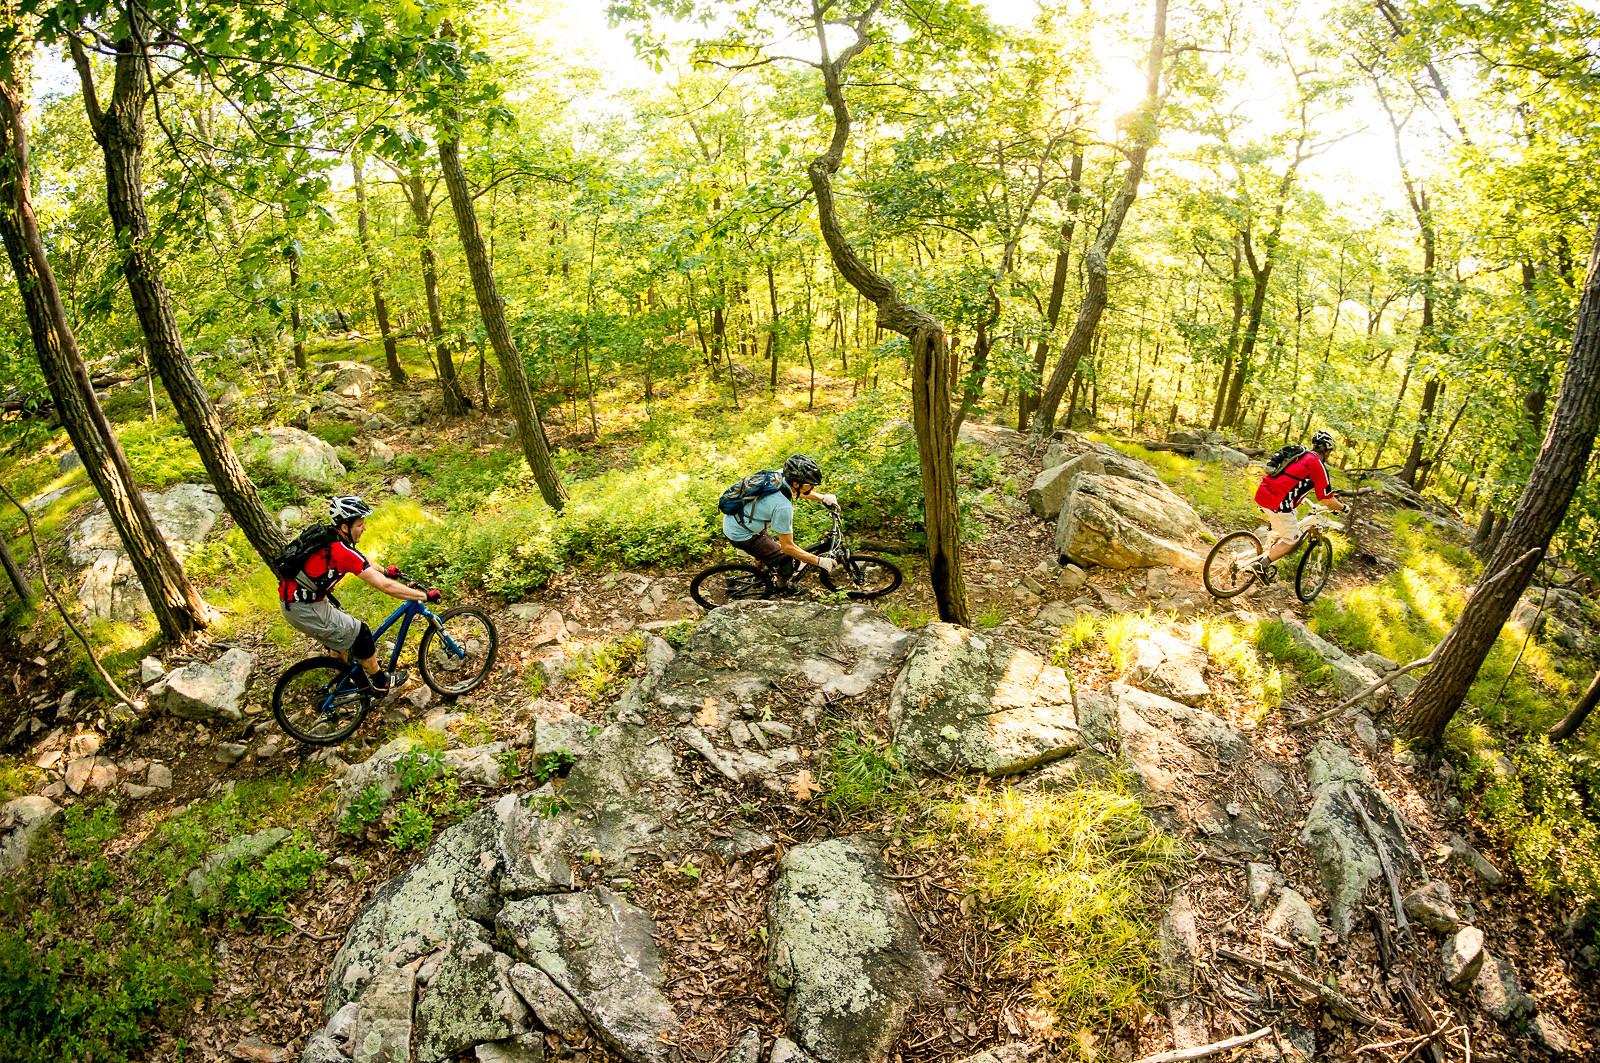 Bombers - jparker - Mountain Biking Pictures - Vital MTB